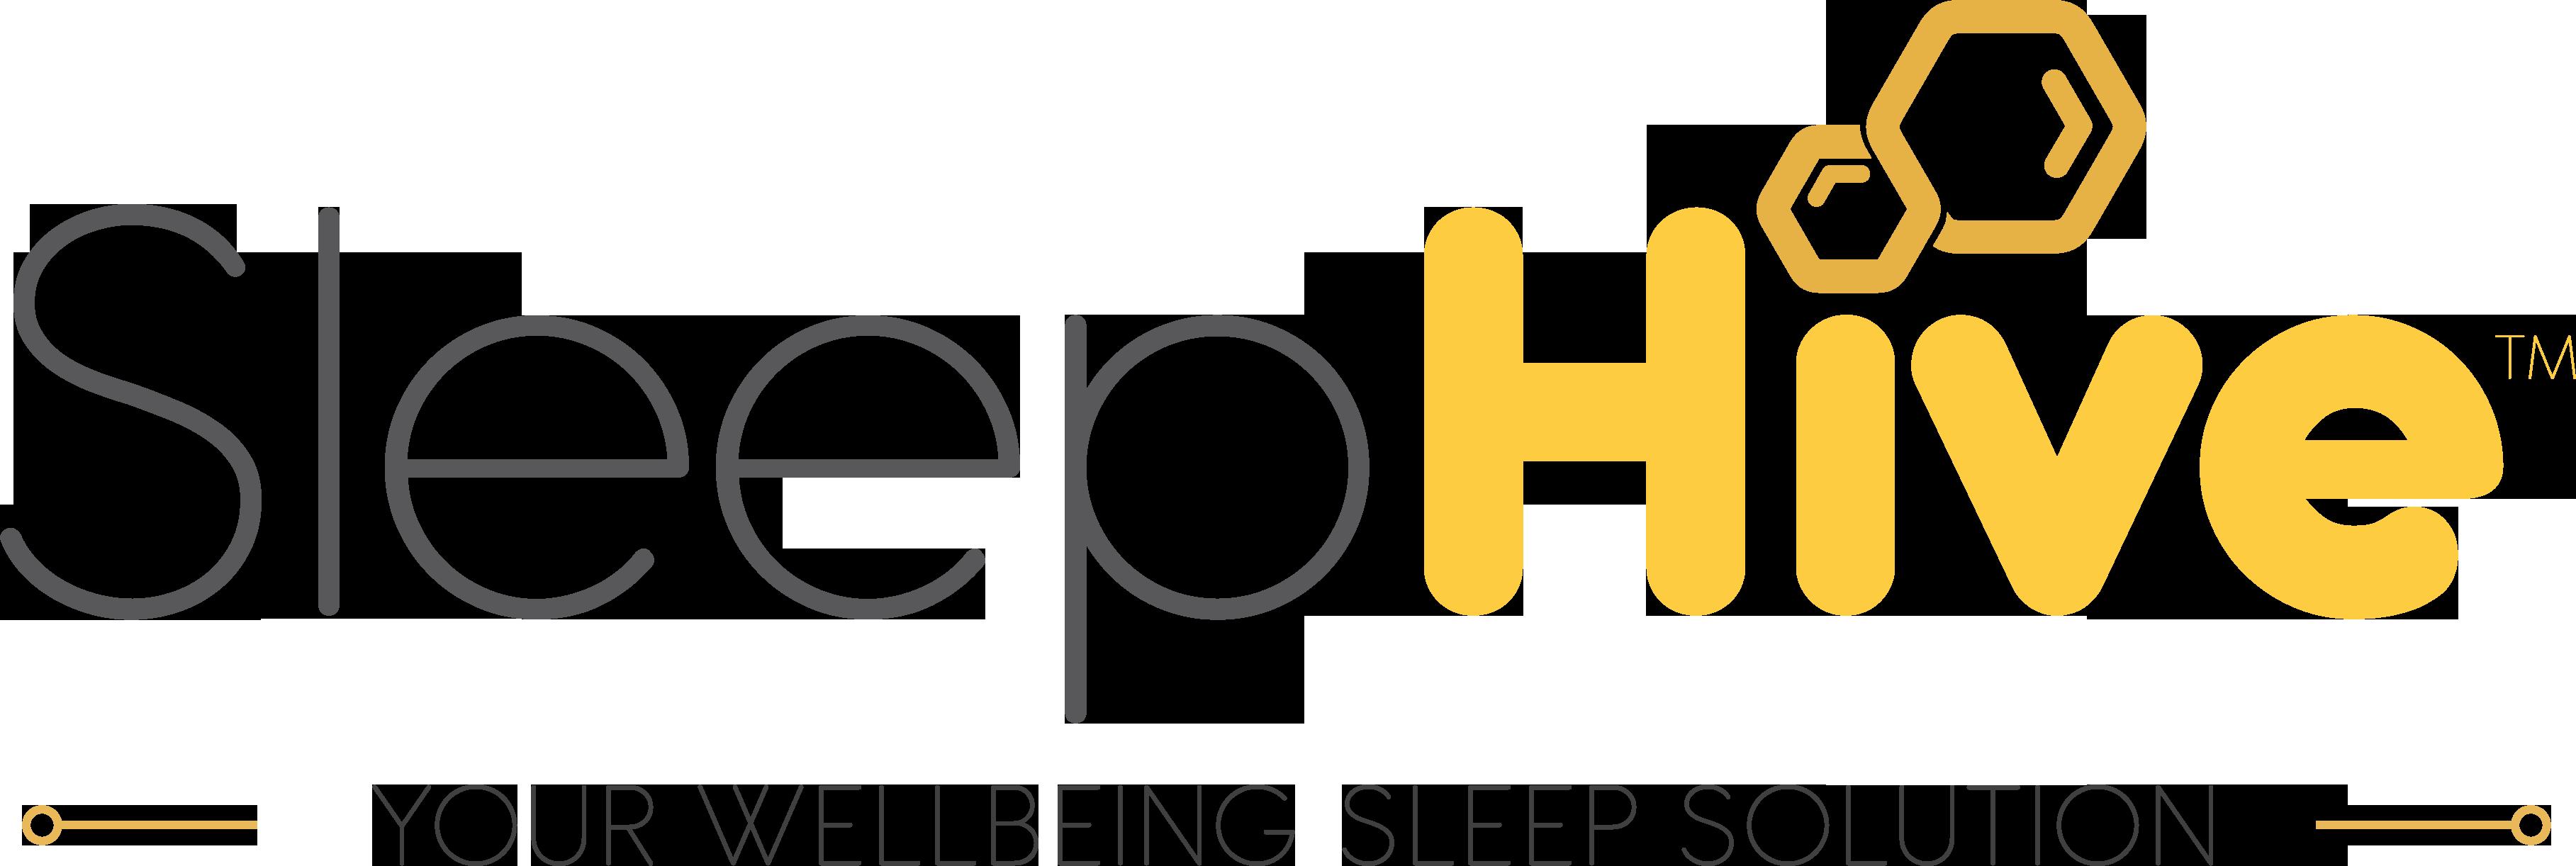 SleepHive